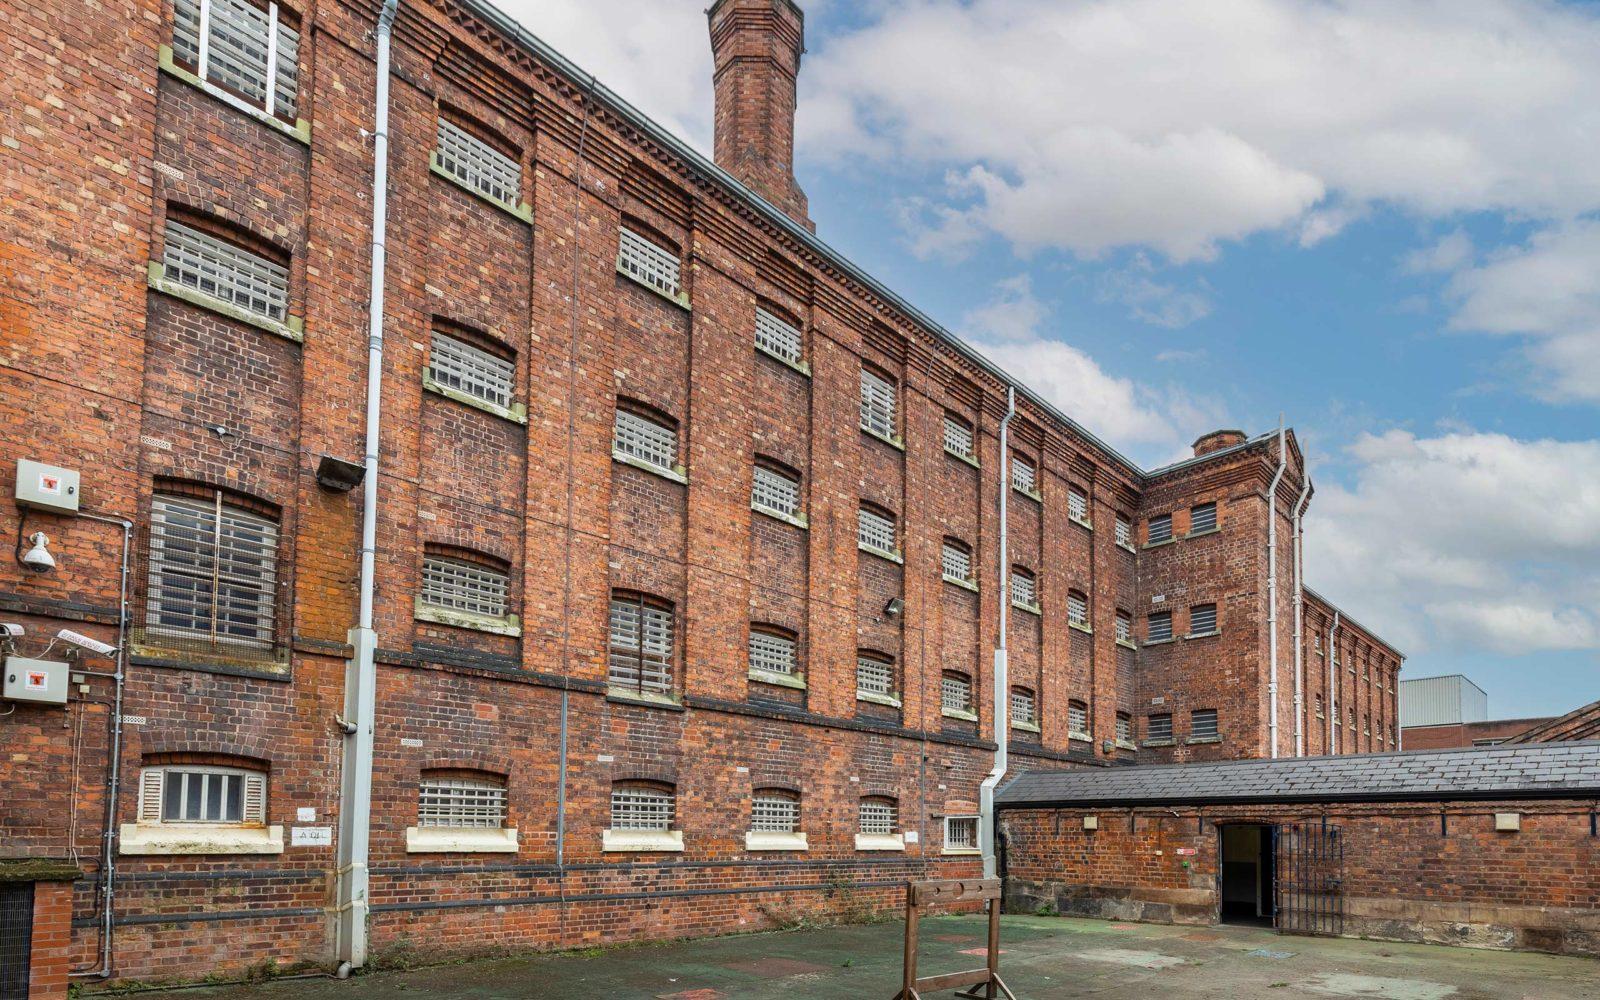 Shrewsbury Prison History